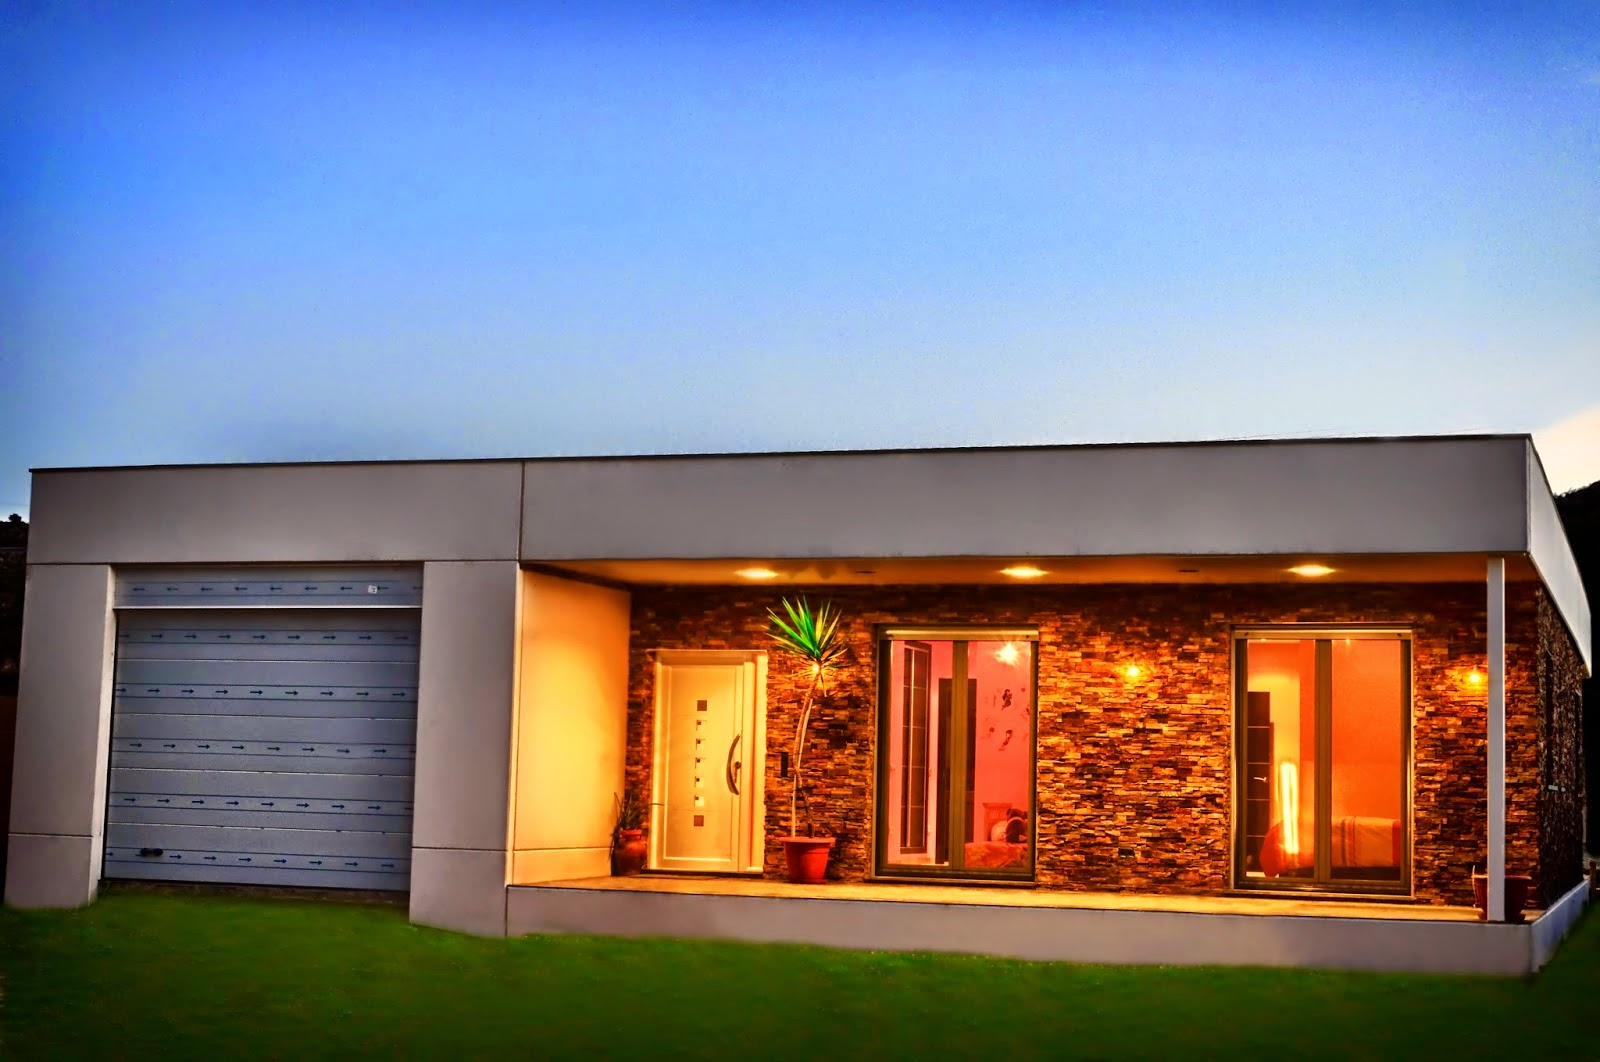 Arquitectura casas modulares taringa - Viviendas modulares diseno ...